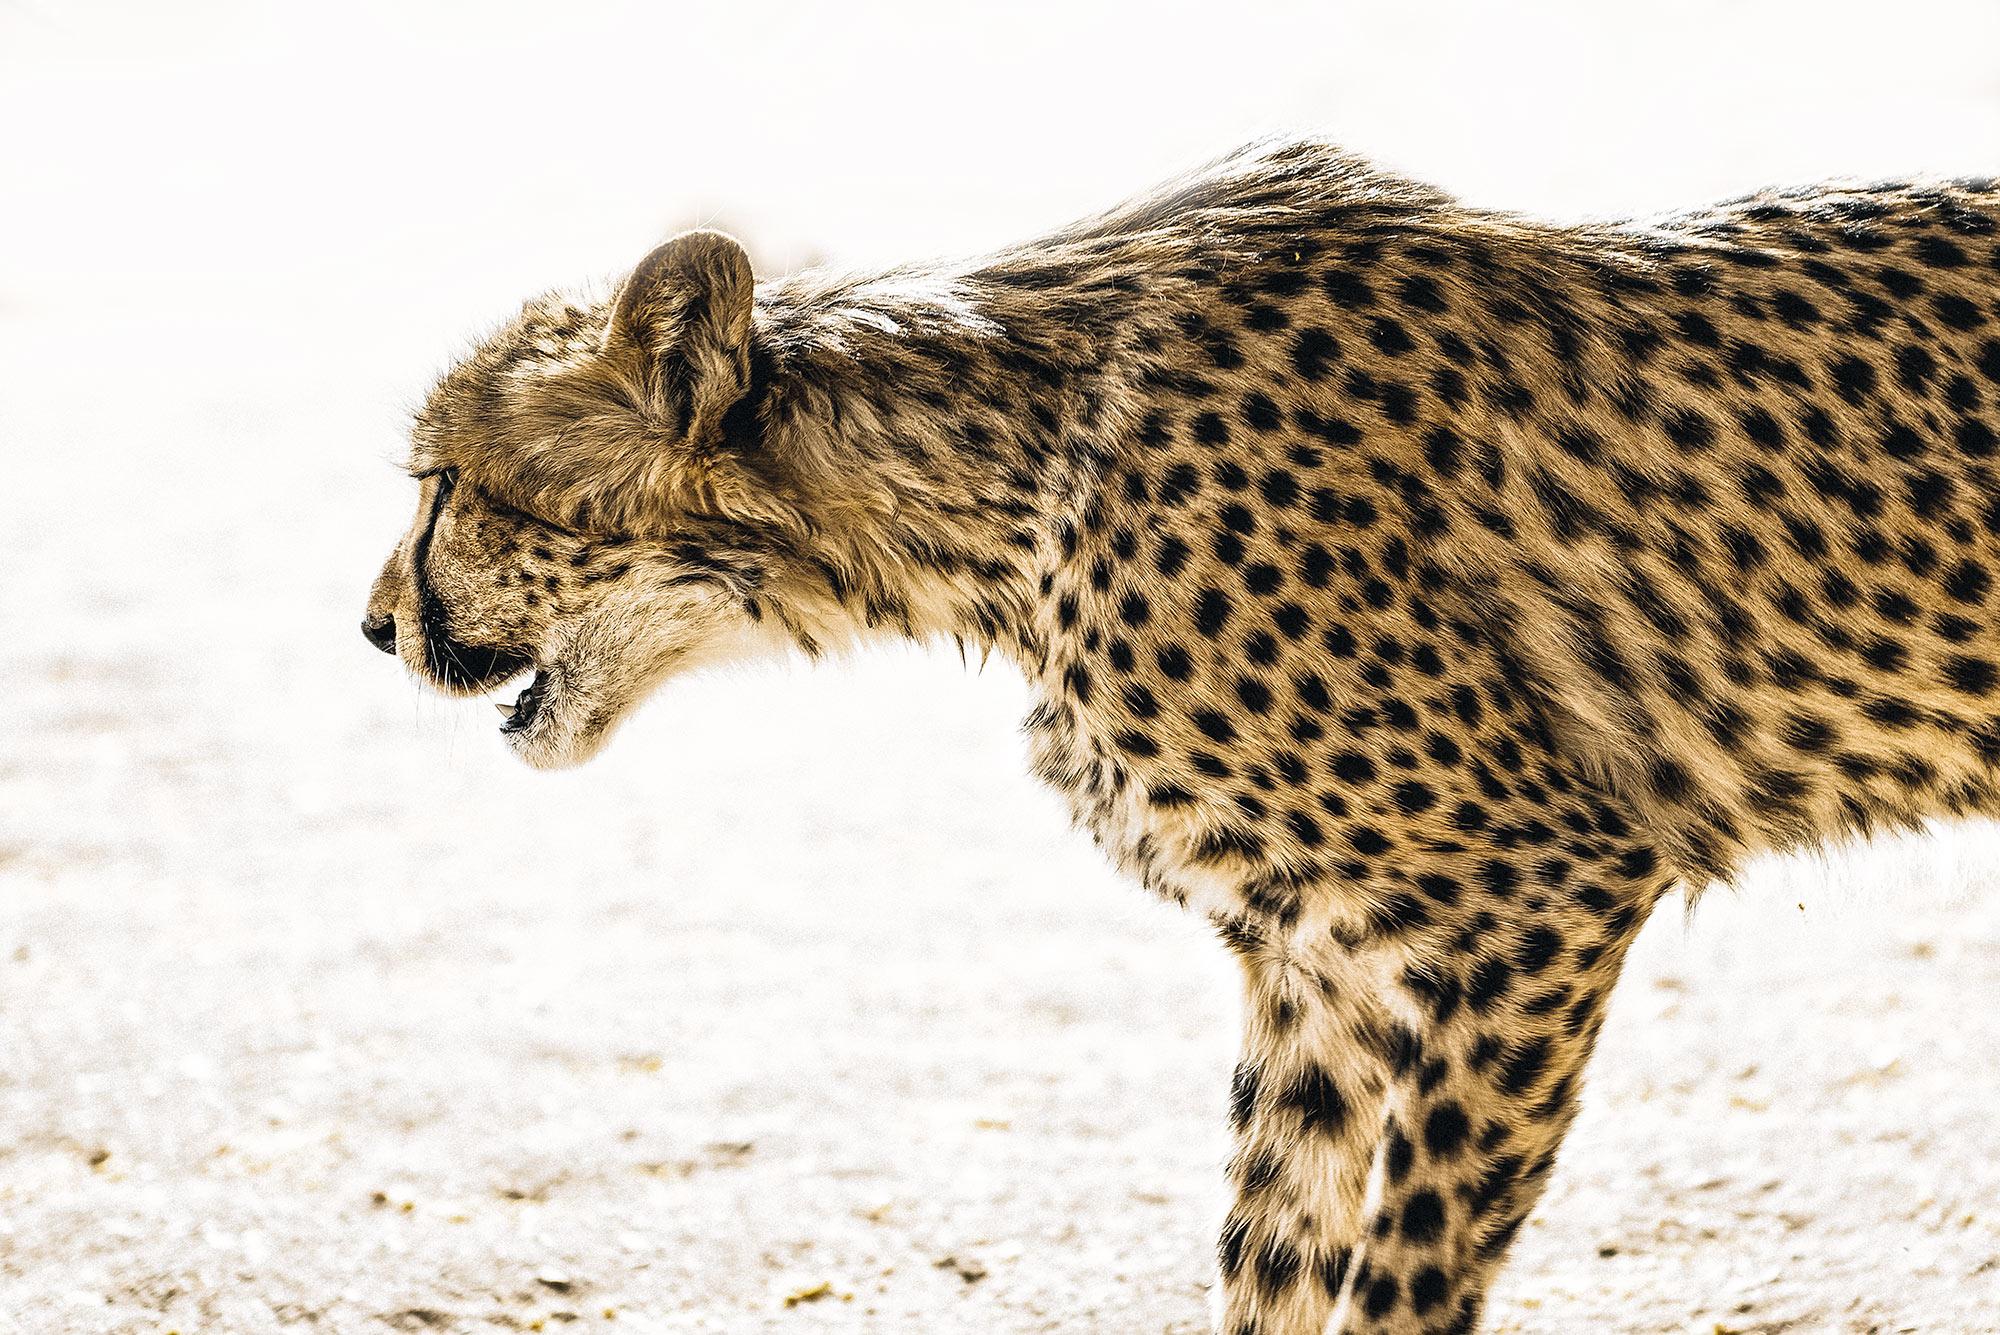 Cheetah-namibia-wildlife-africa.jpg